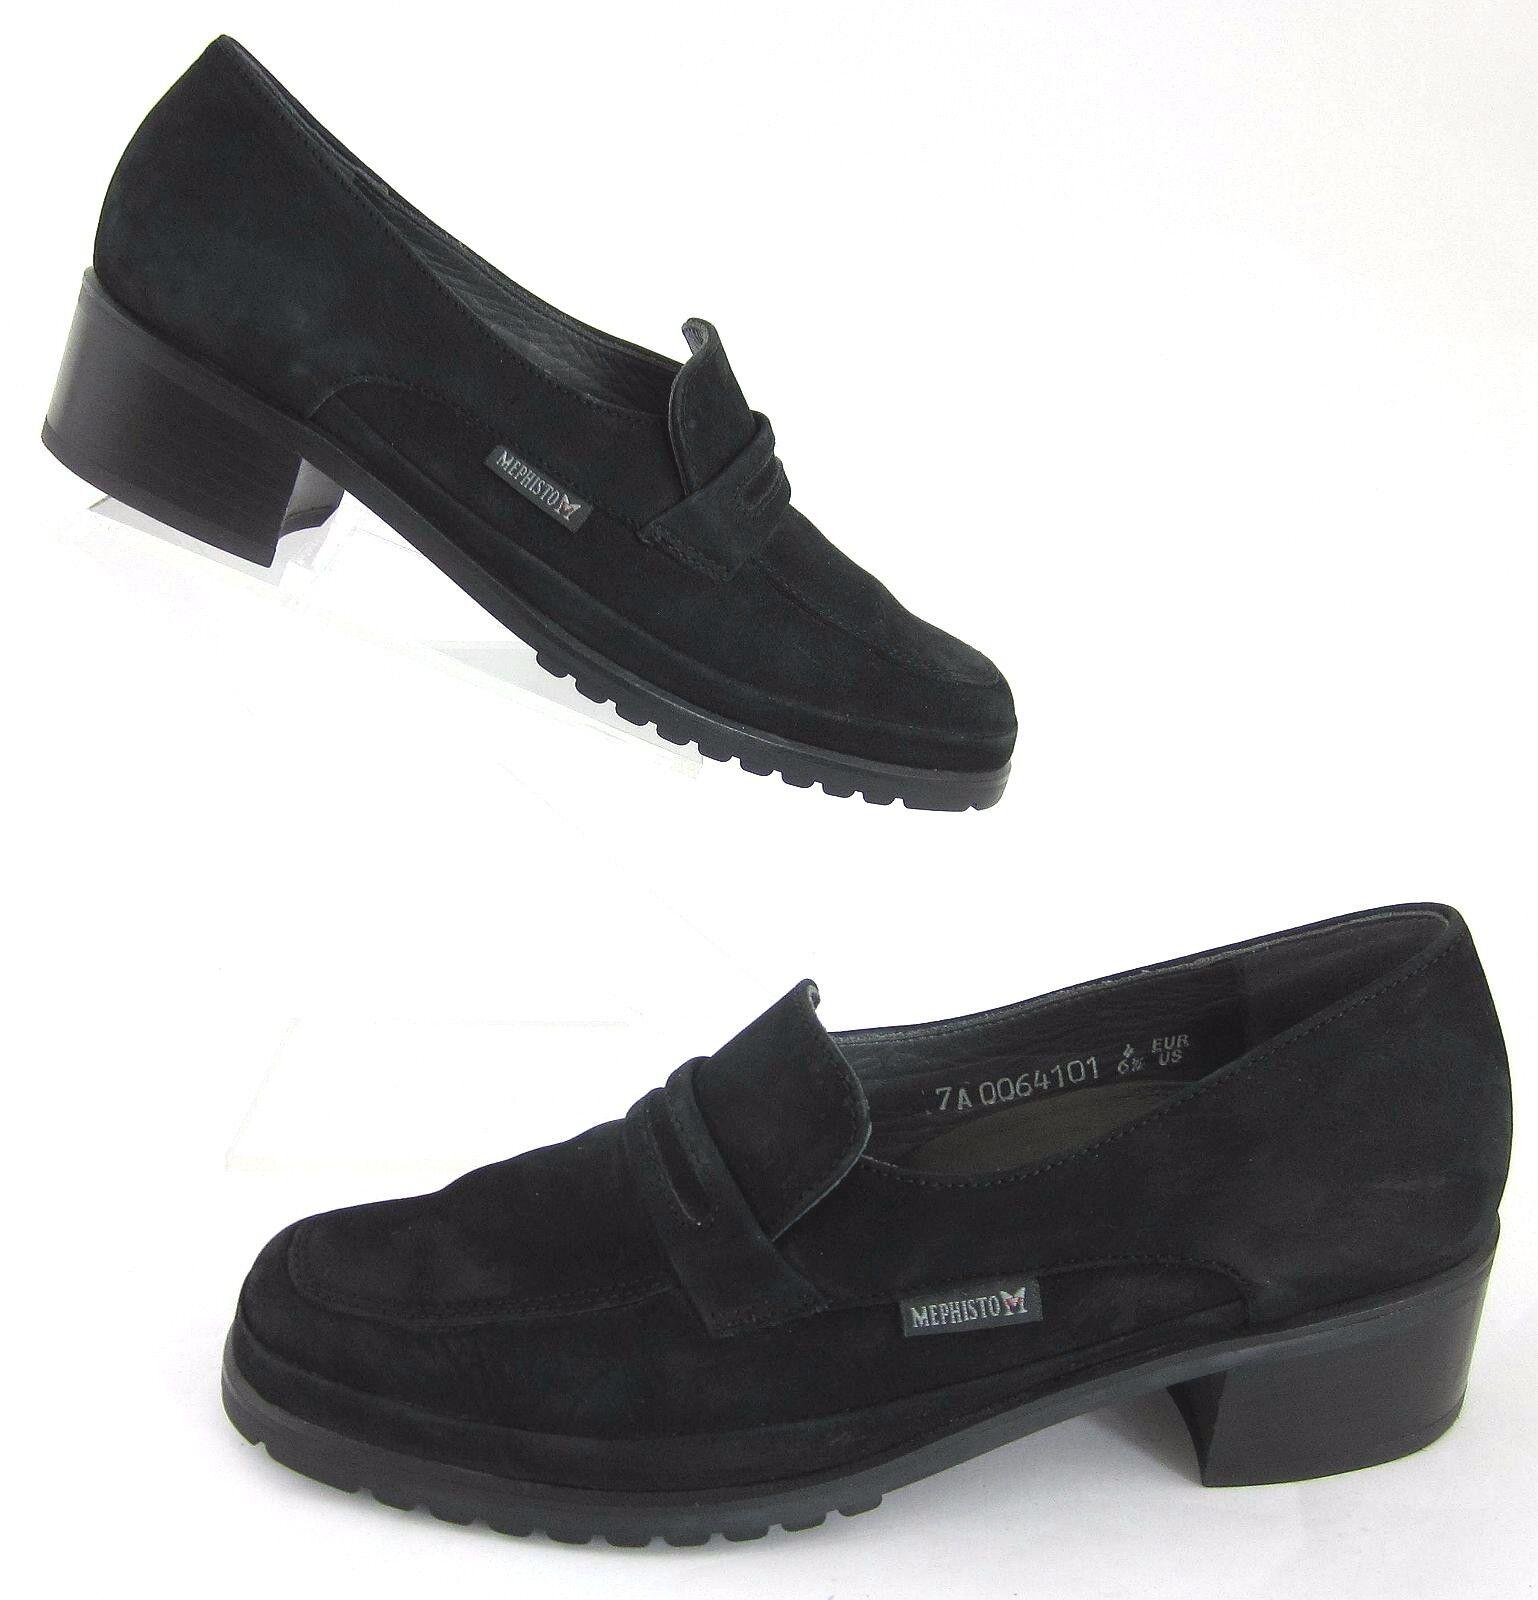 Mephisto Womens Moc Toe Low Heel Loafers Black Suede Sz 6.5